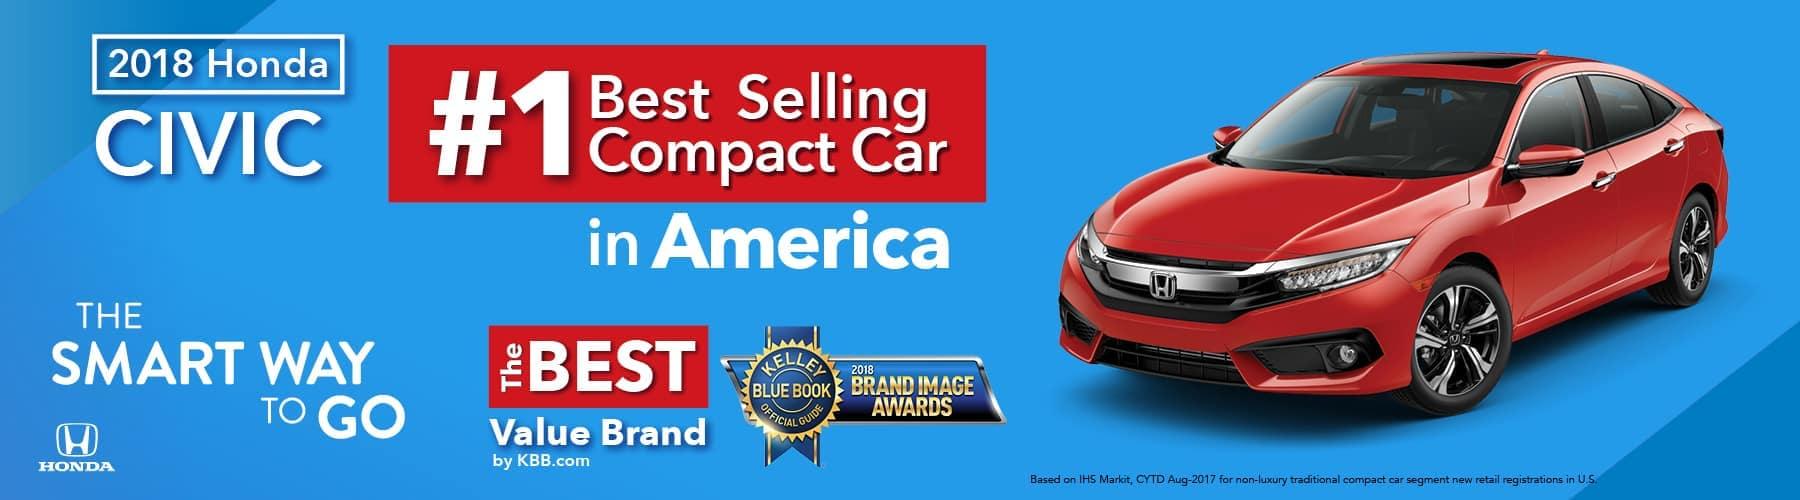 2018 Honda Civic Kelley Blue Book Best-Selling Compact Car in America